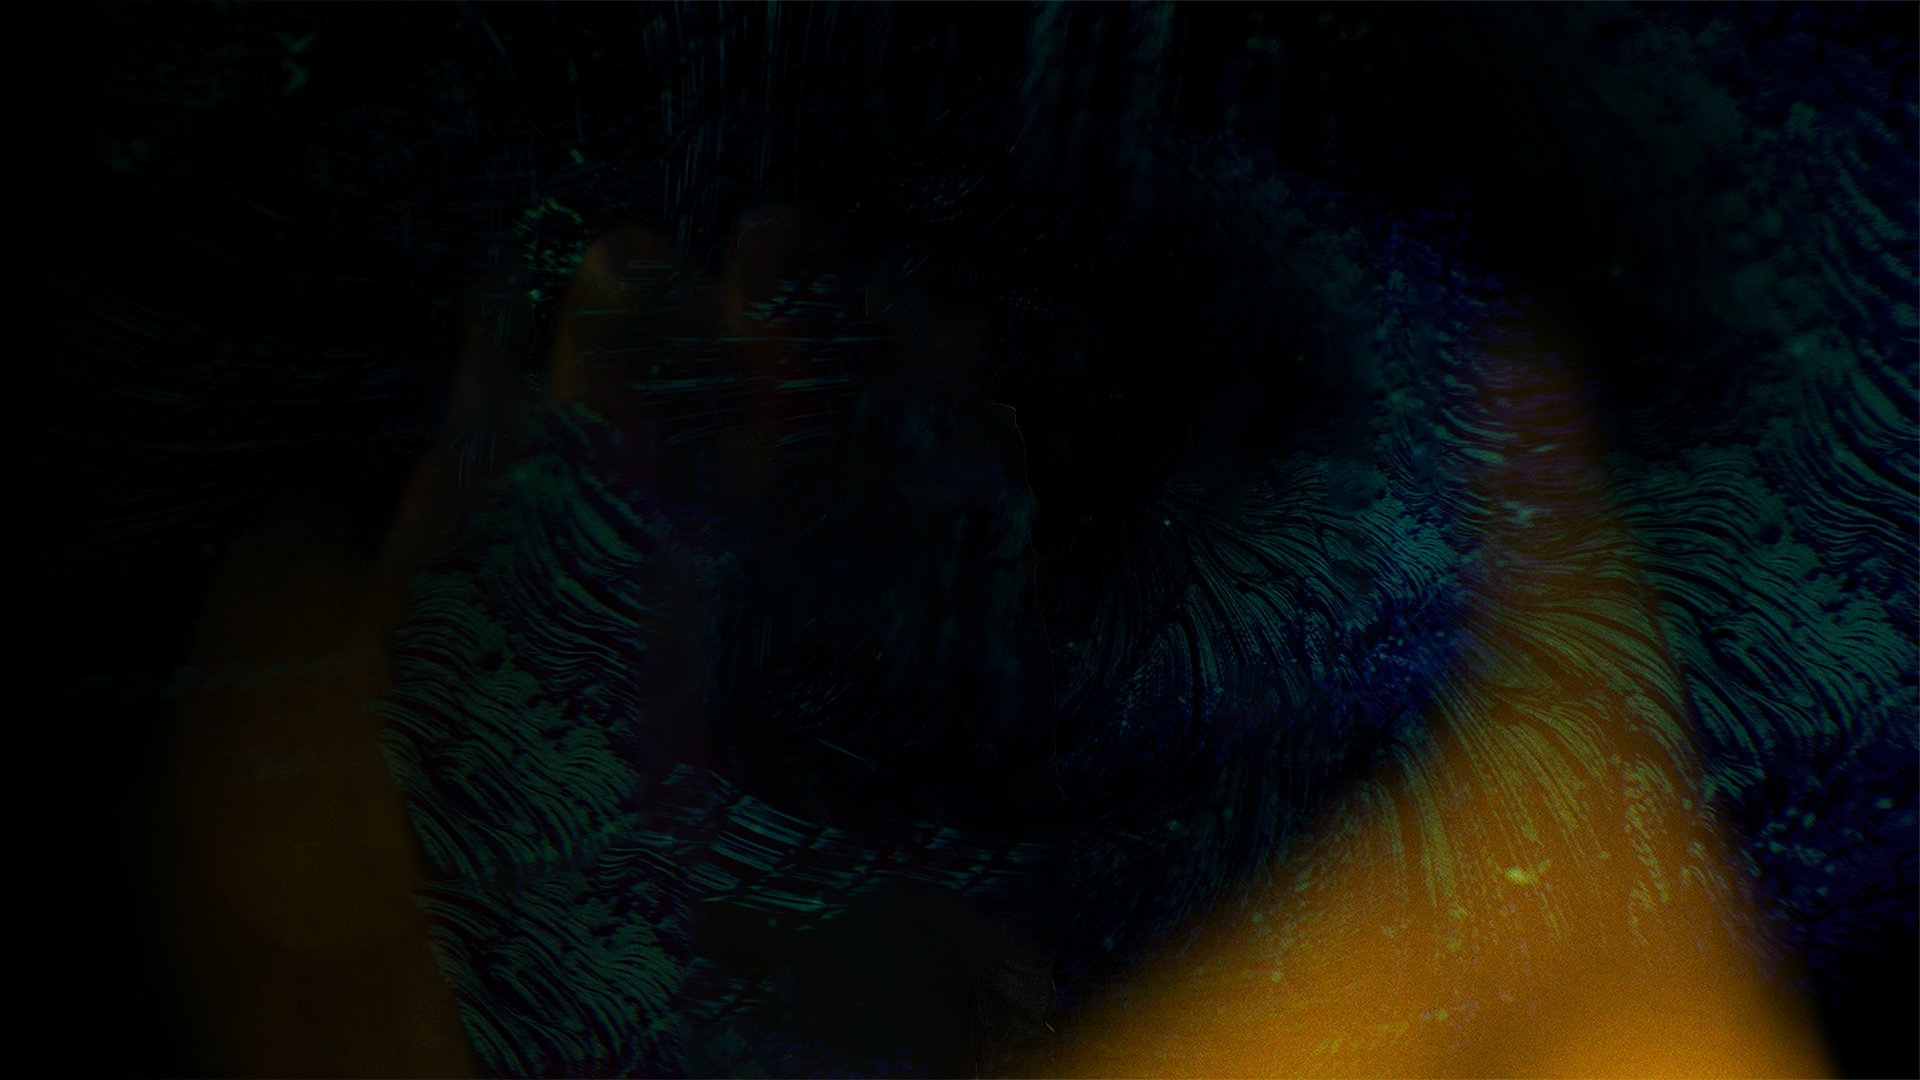 fond Evil - S01 E06 - Alerte Rouge